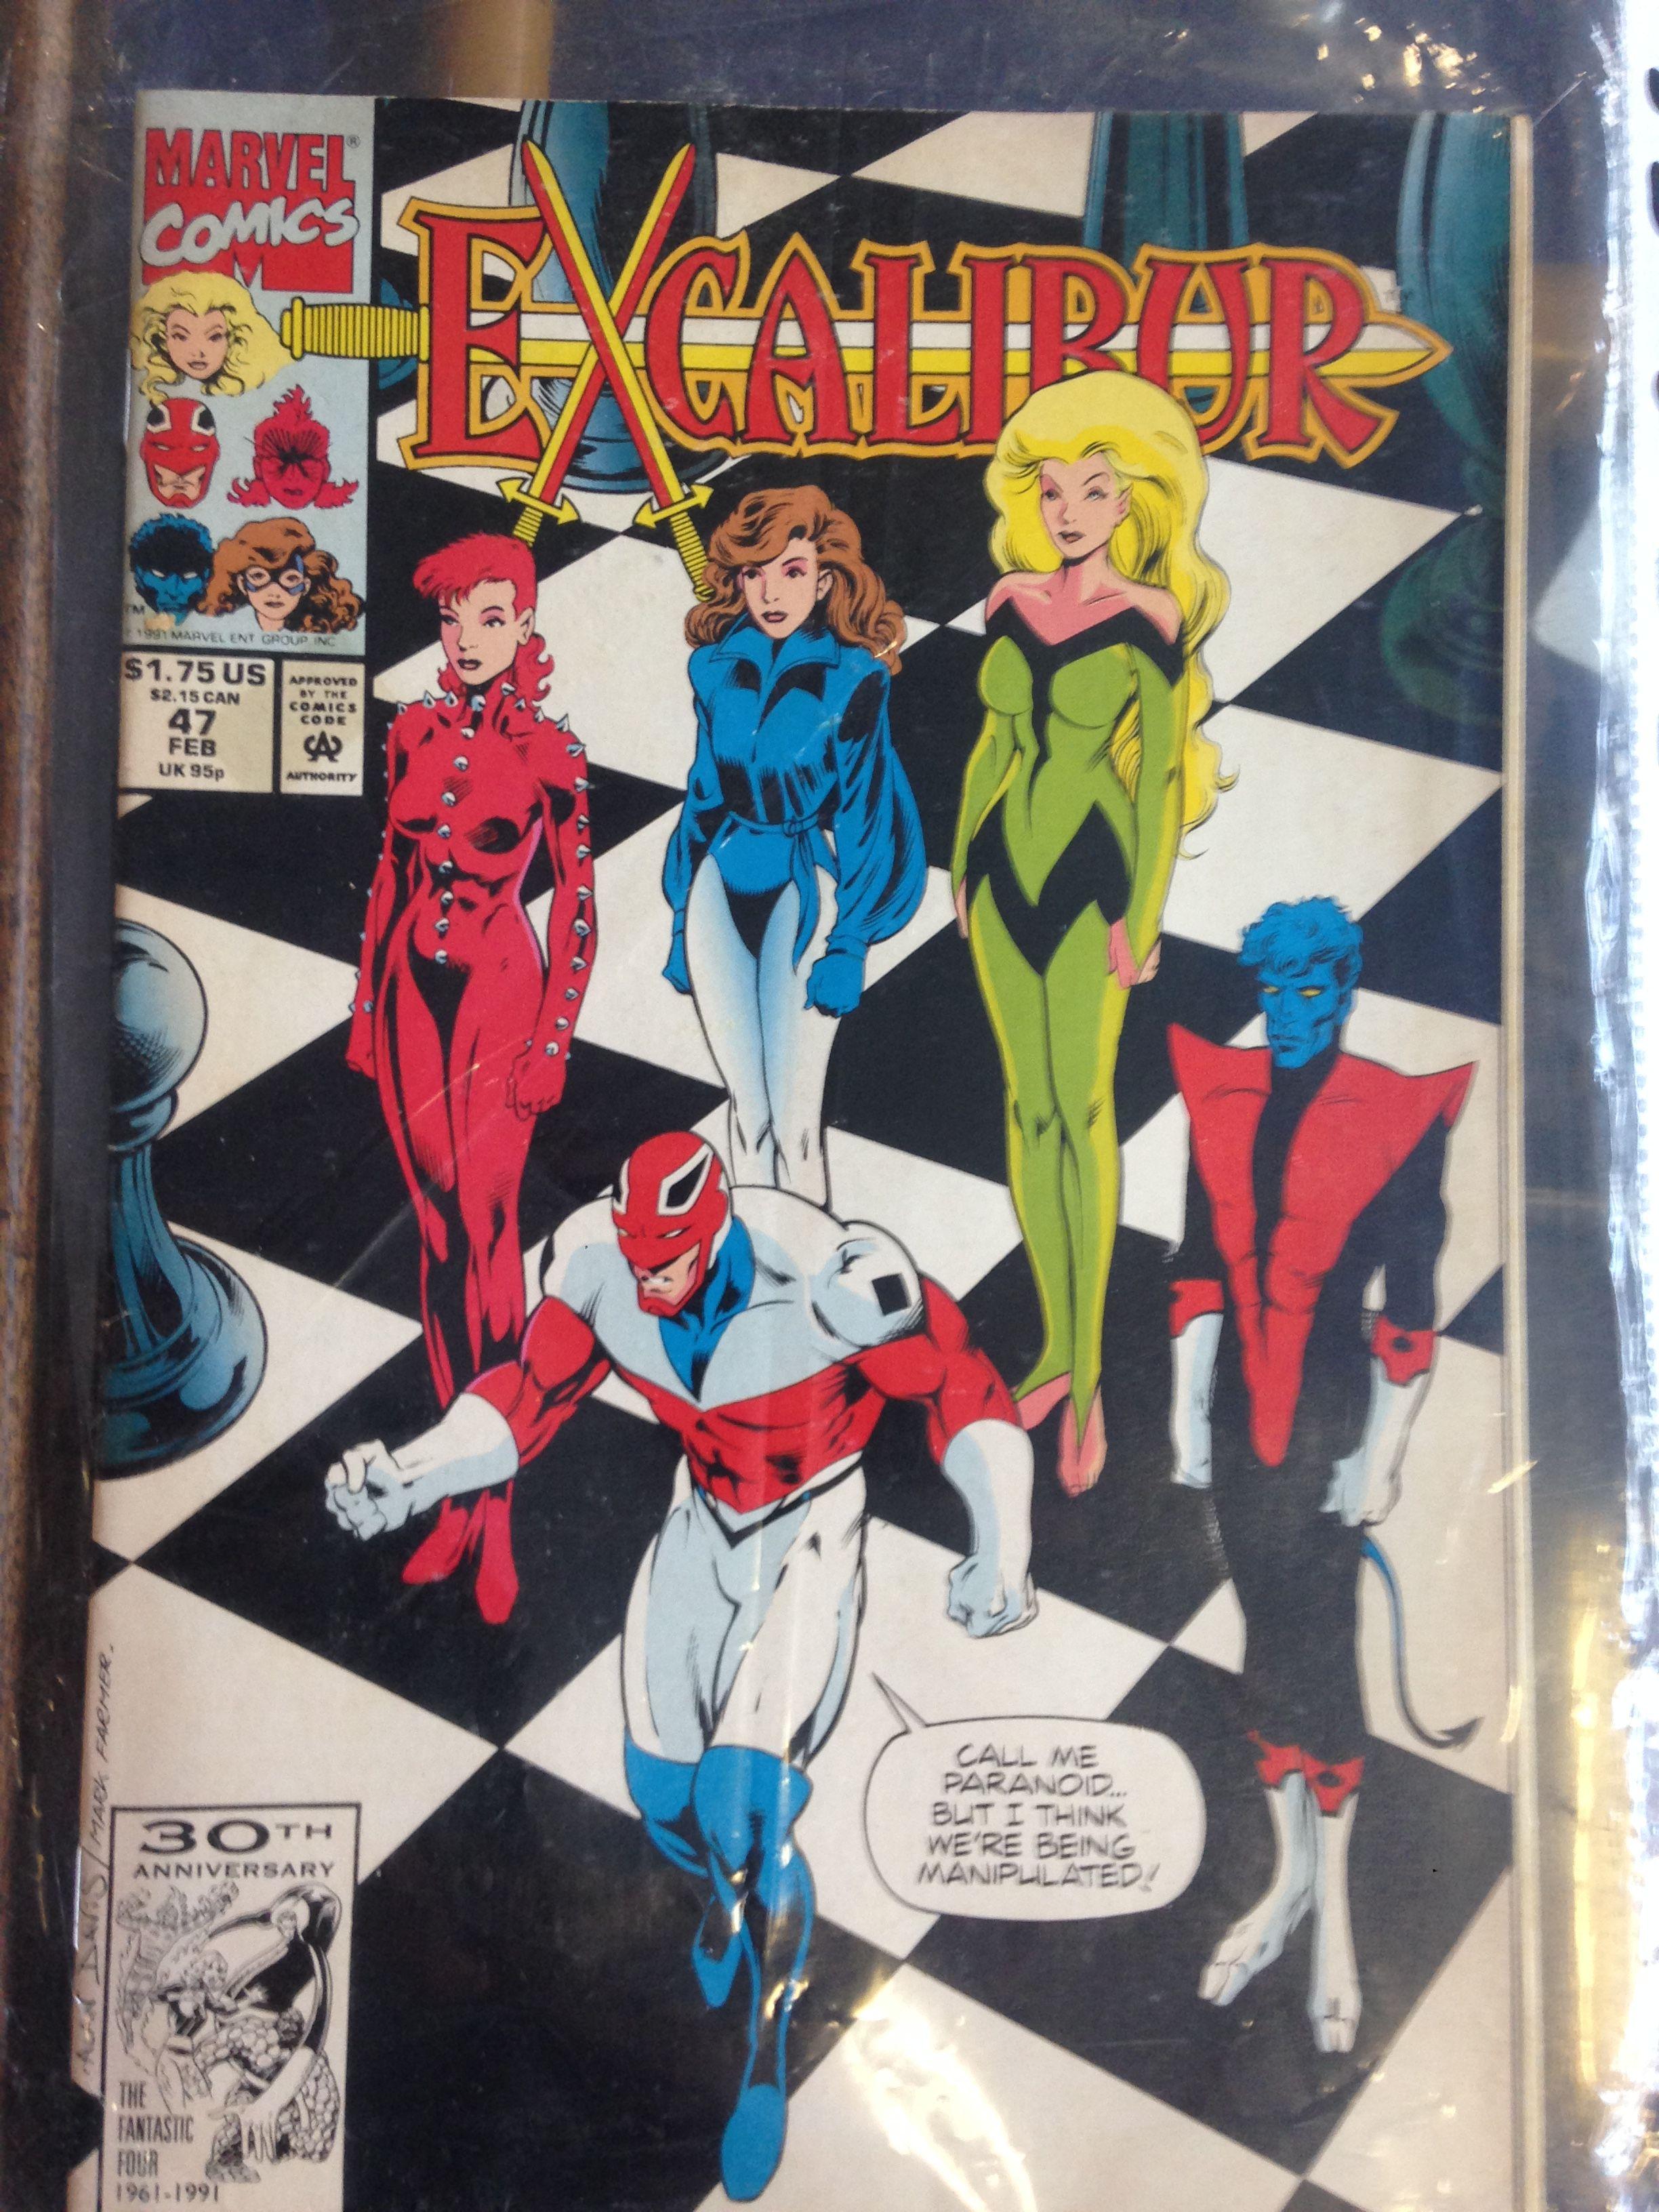 Marvel Excalibur vintage comic for sale at Black Fish Collectables